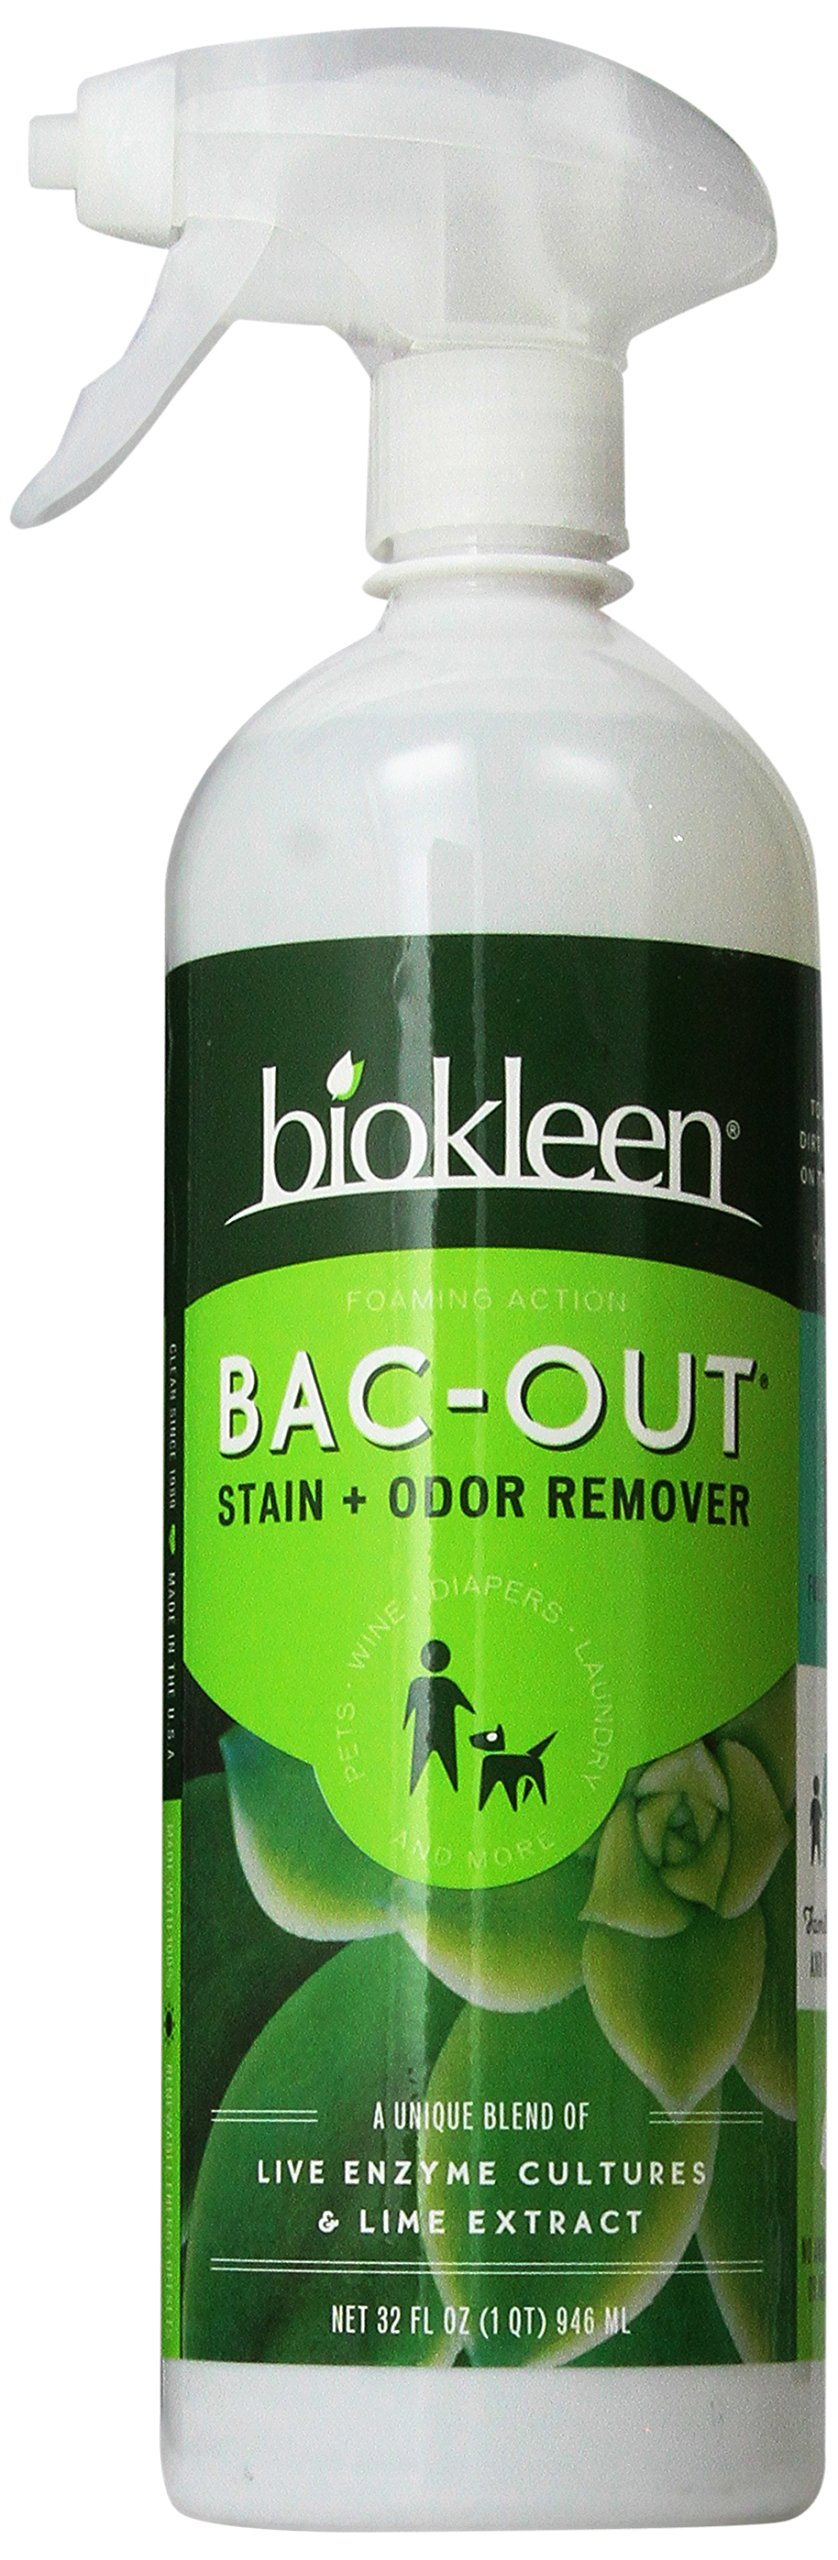 Biokleen Bac-Out Stain+Odor Remover Foam Spray, 32 oz